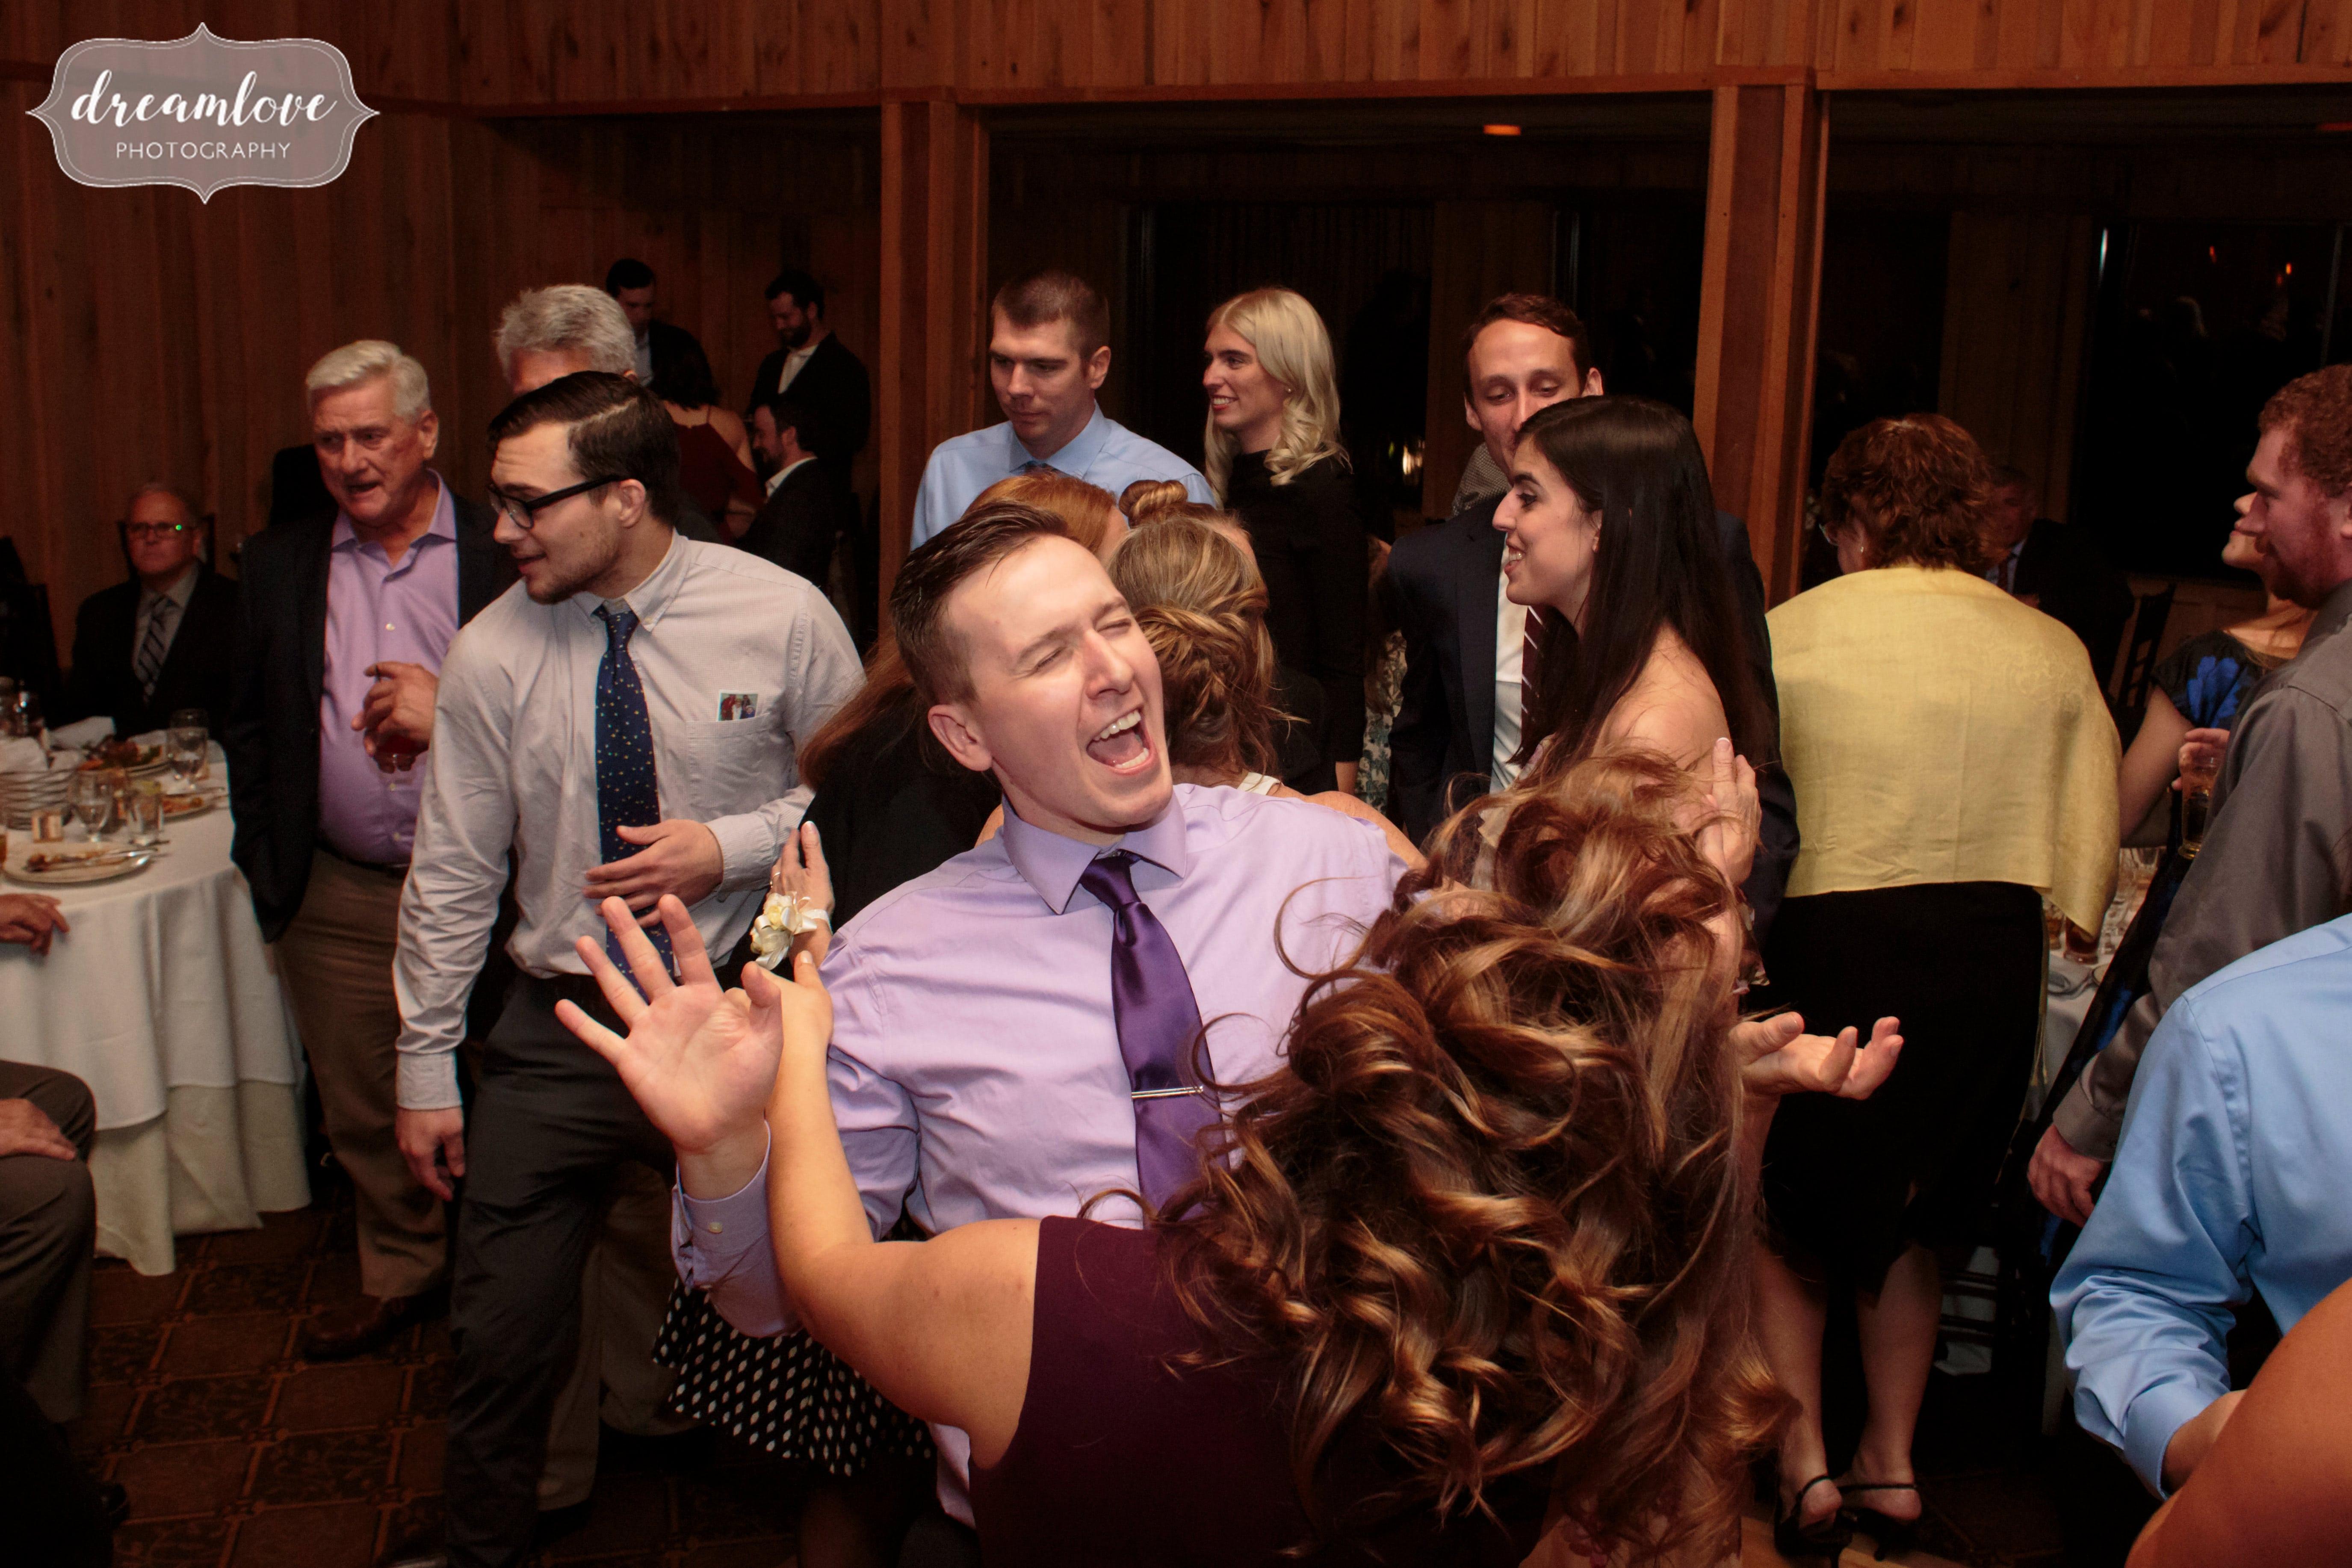 Funny wedding guests dancing at the Crystal Lake Pavilion.